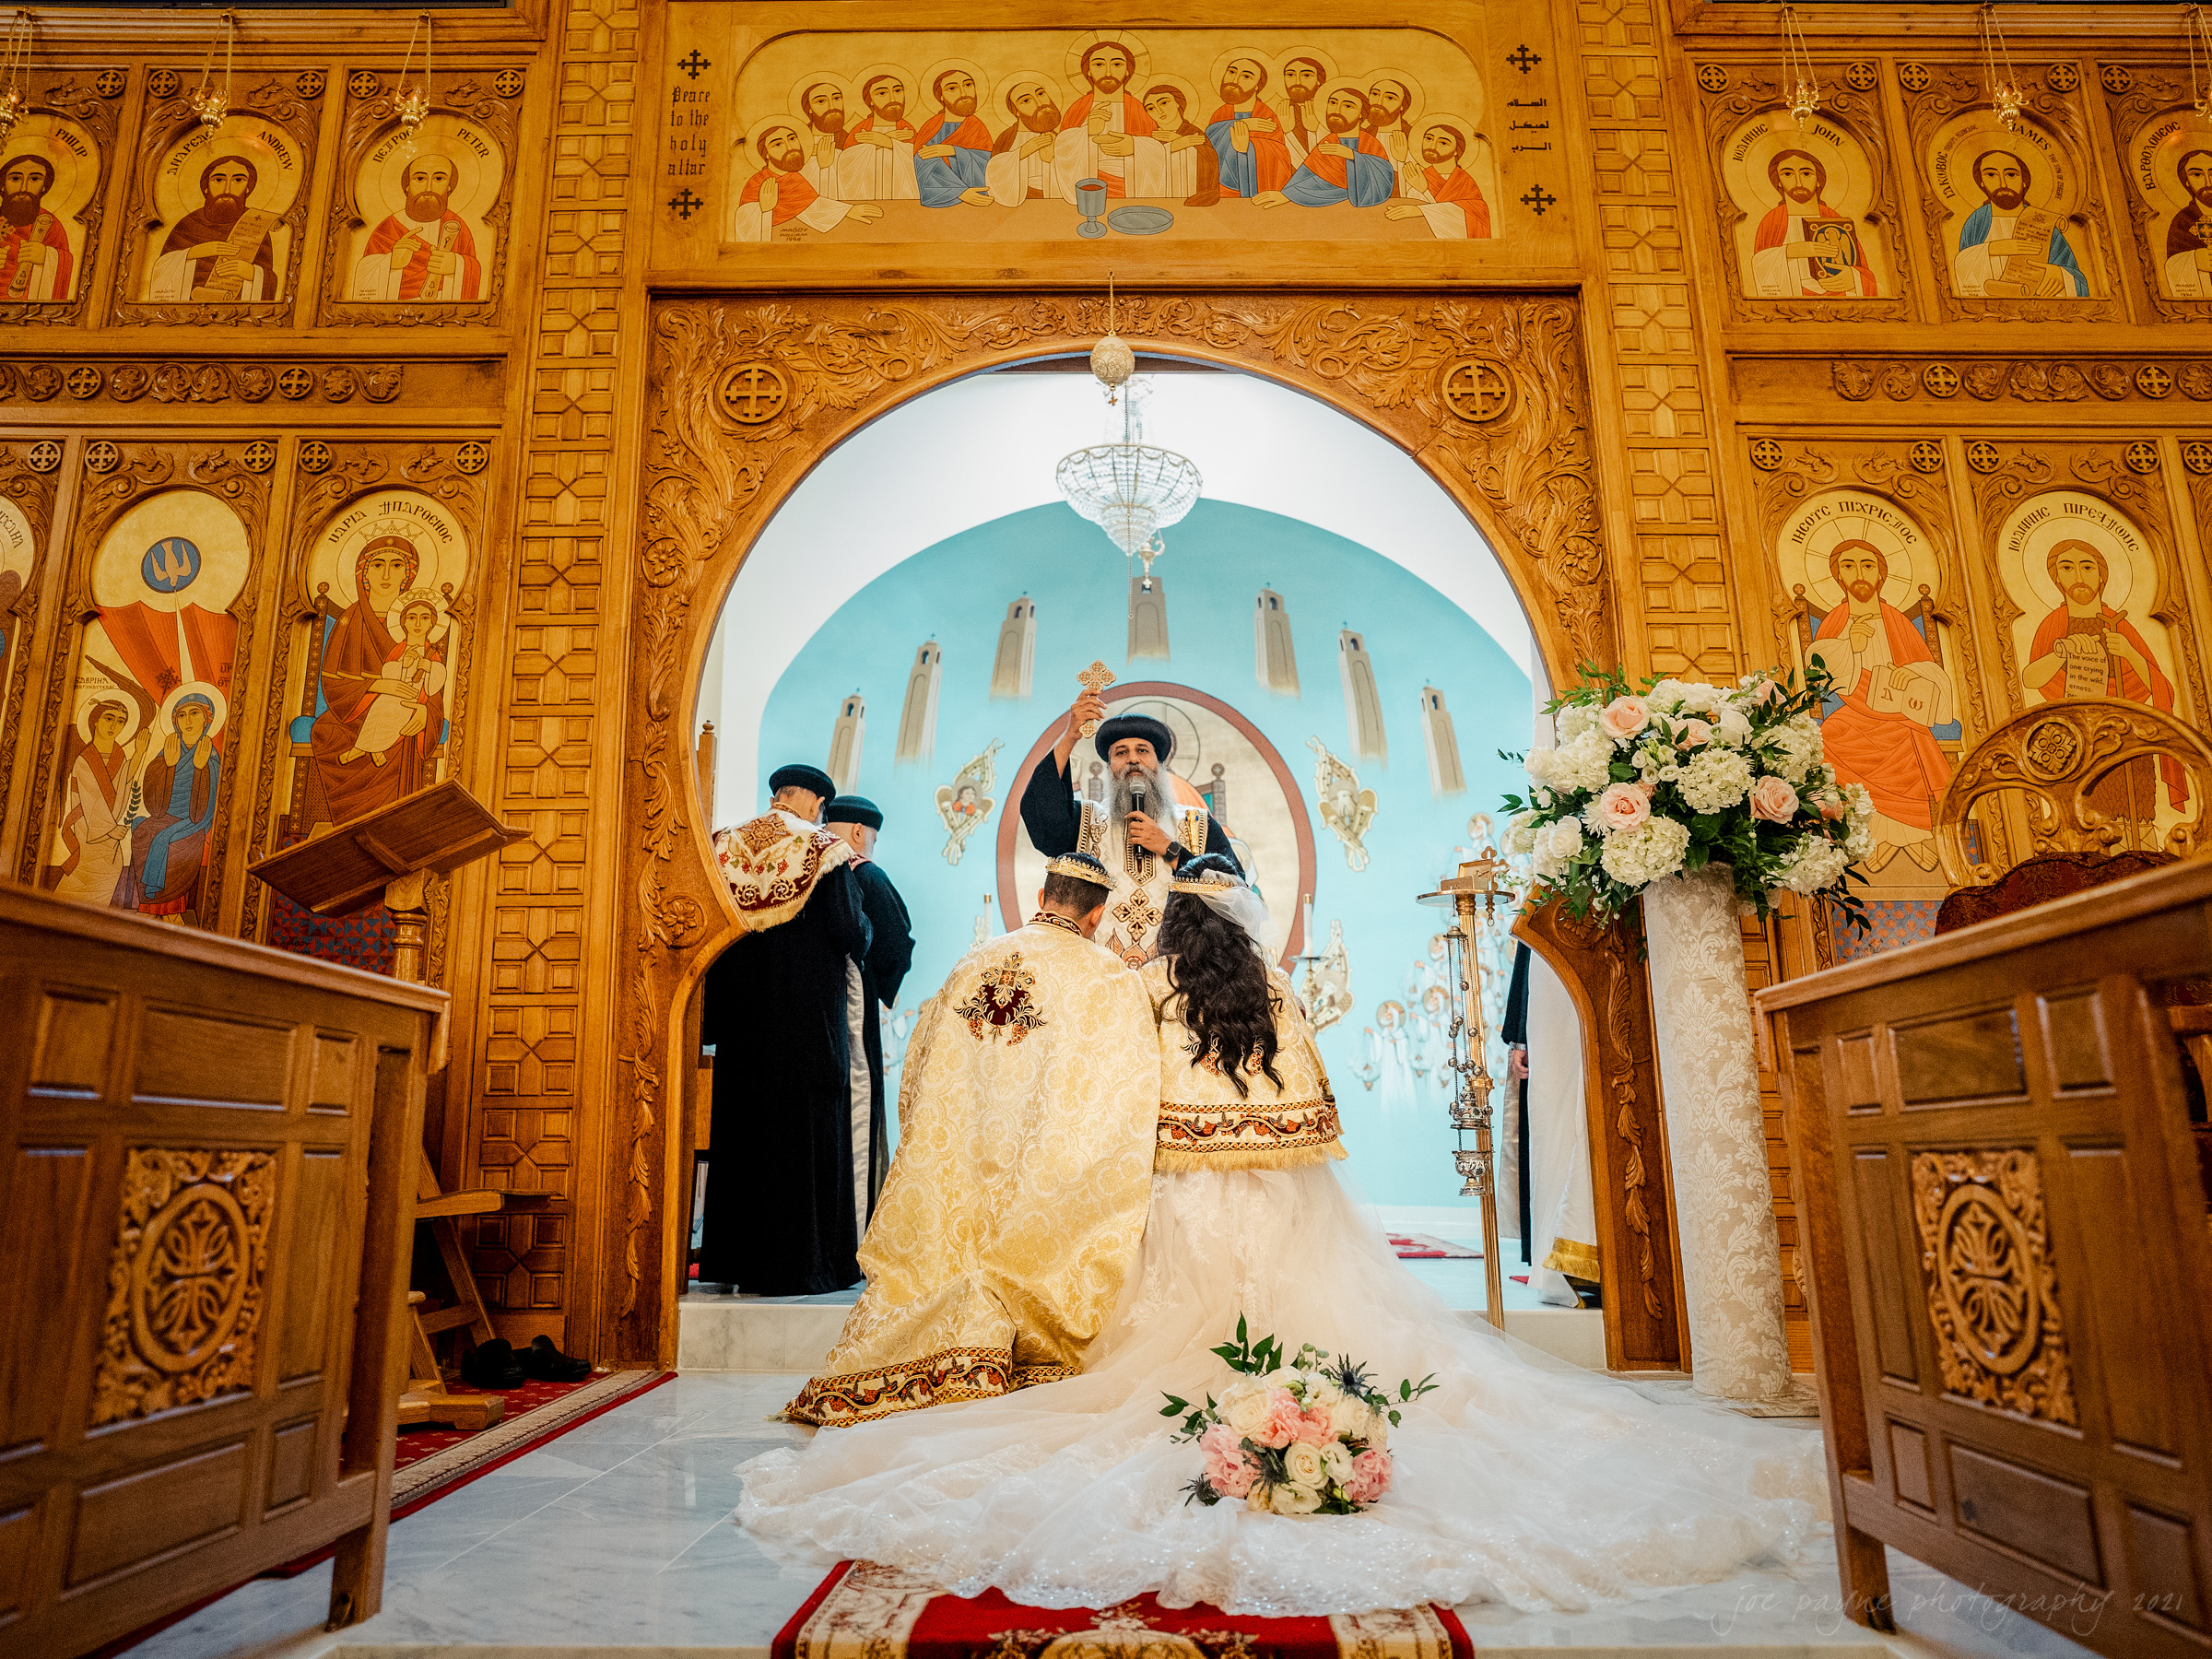 St Mary Coptic Orthodox Church wedding photo of couple at altar